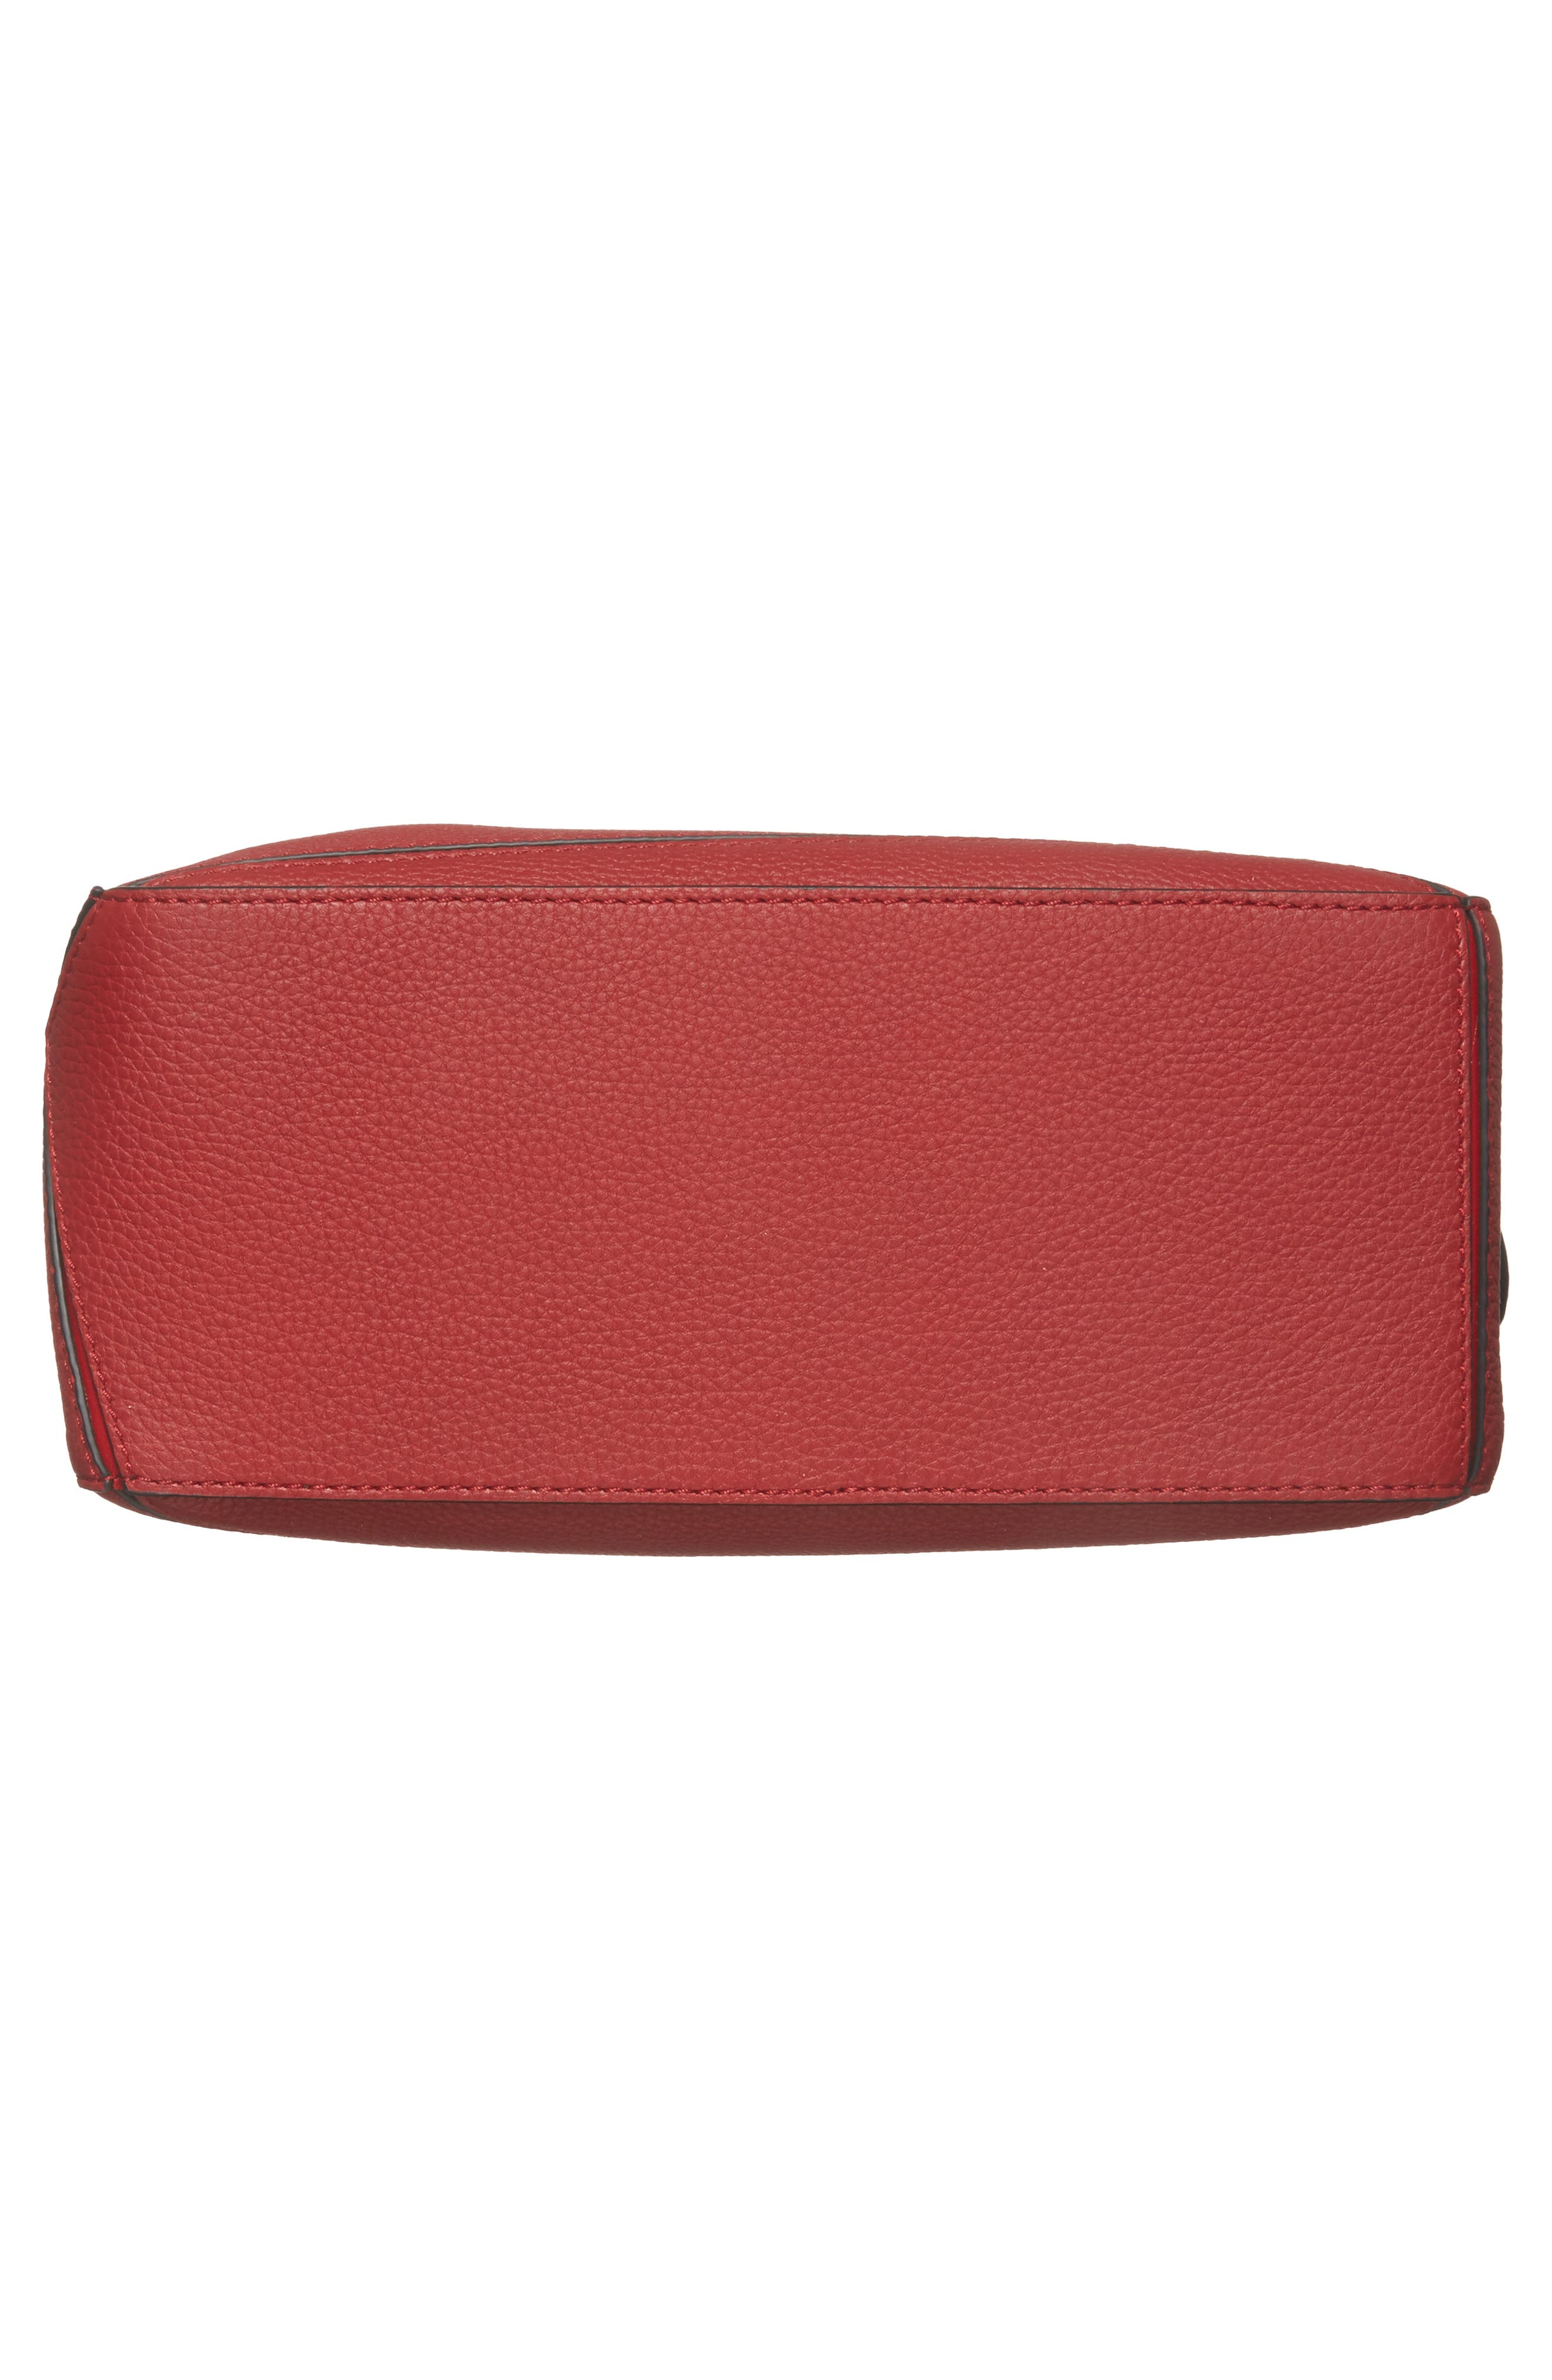 Small Puzzle Leather Shoulder Bag,                             Alternate thumbnail 6, color,                             Rouge